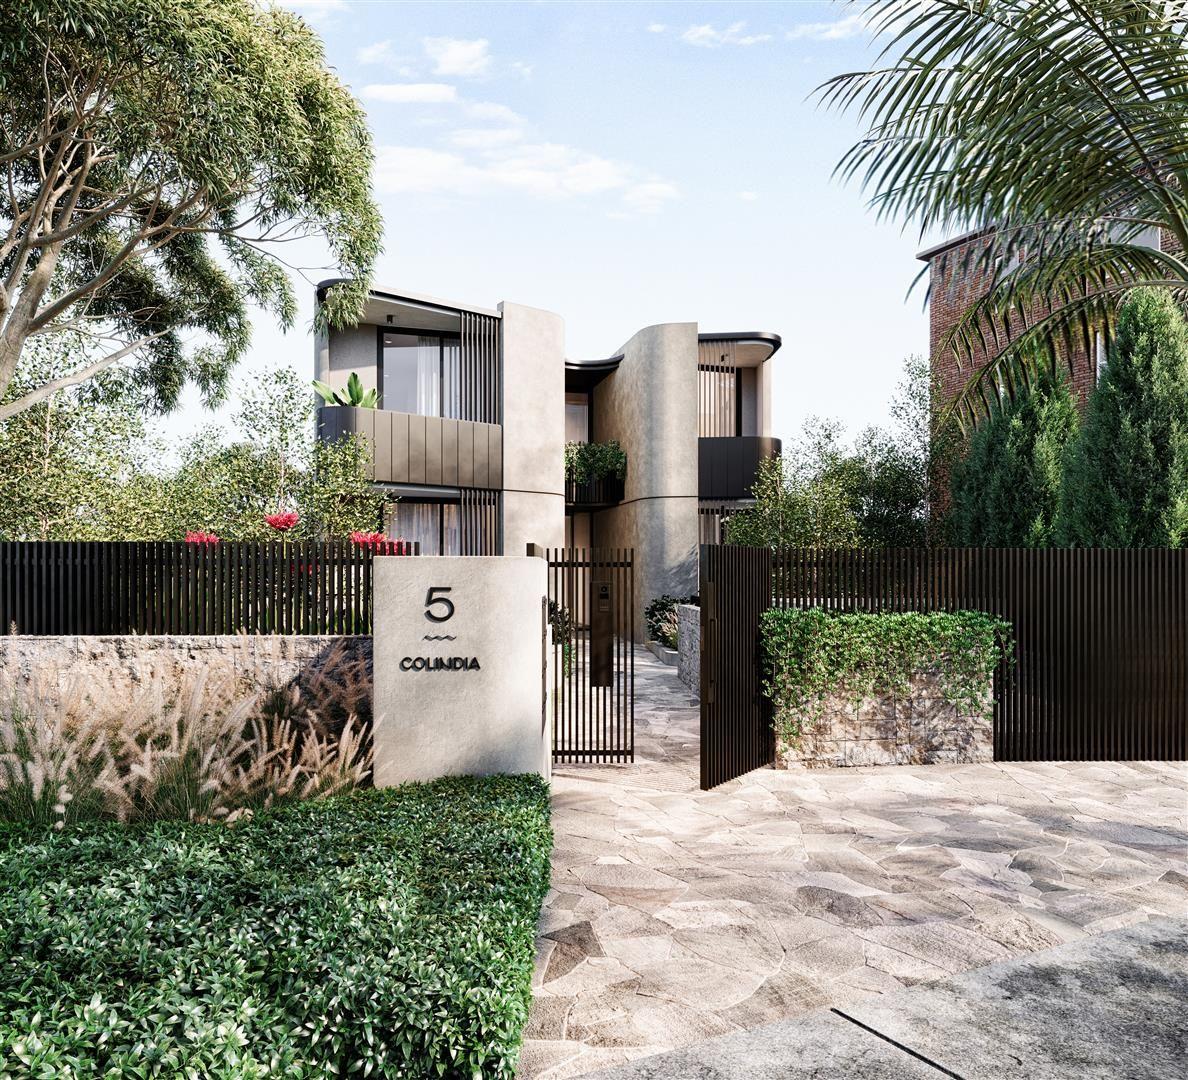 5 Colindia Avenue, Neutral Bay, NSW 2089, Image 0